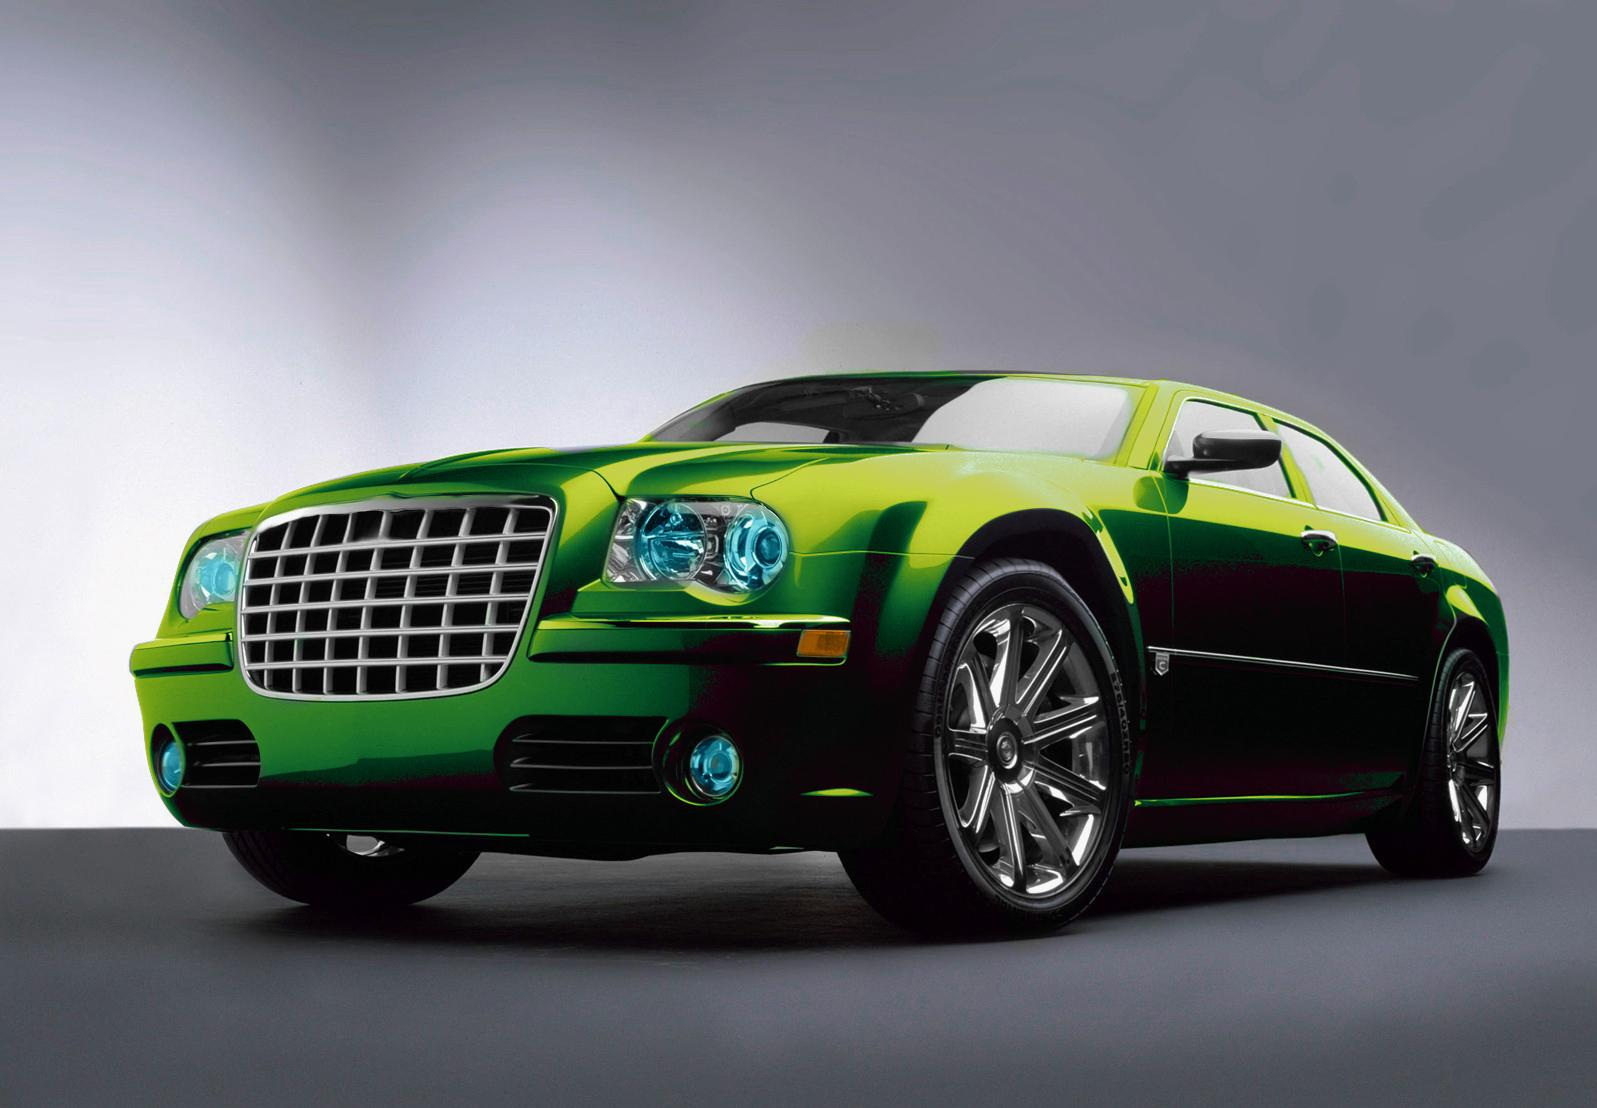 Hd-Car wallpapers: cool car wallpapers